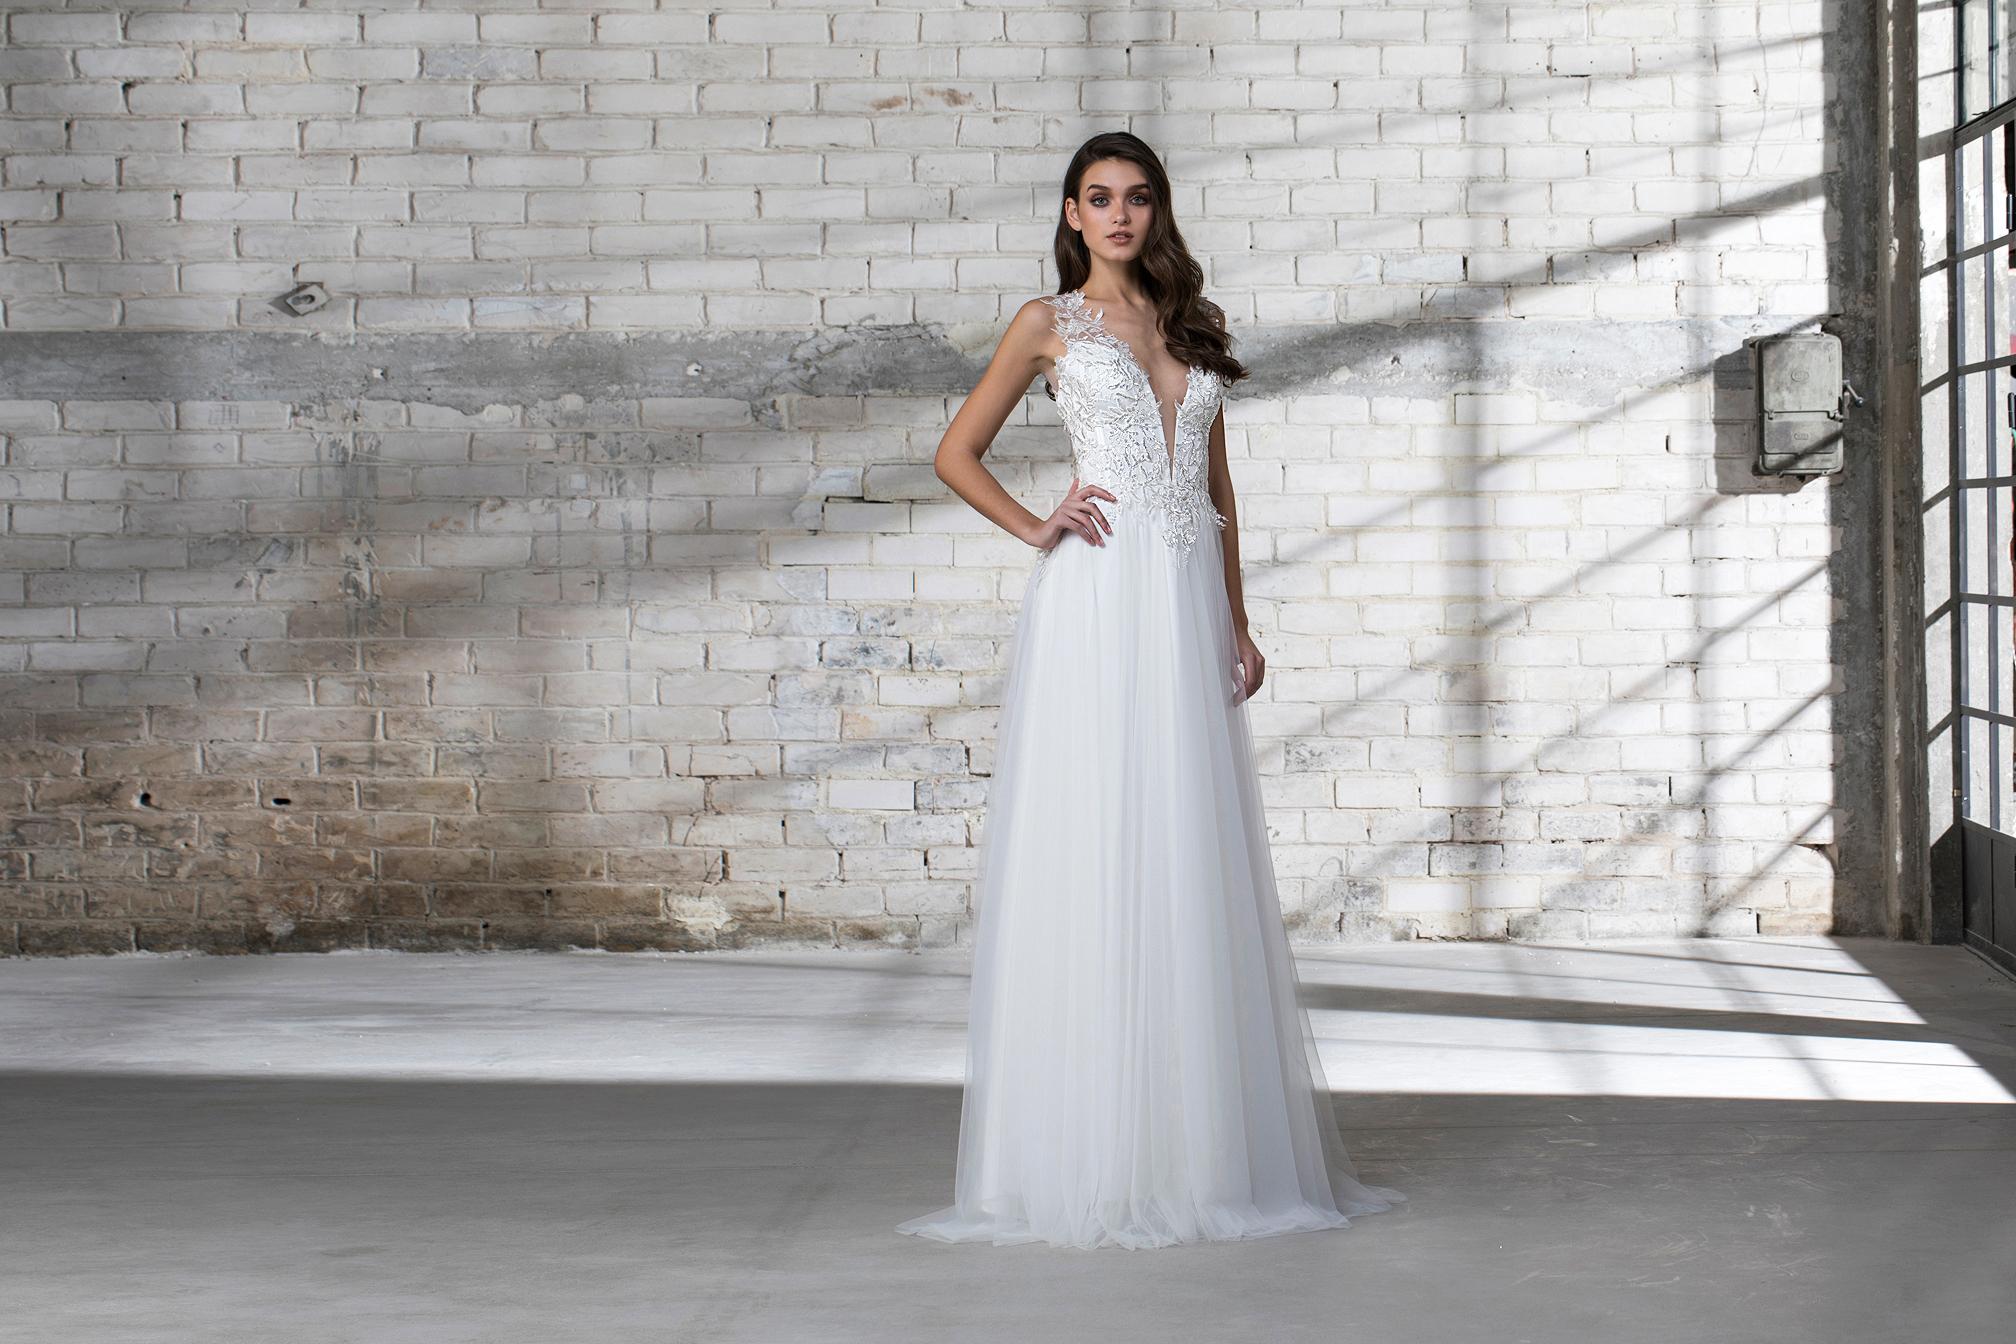 pnina tornai wedding dress spring 2019 tulle a-line deep v